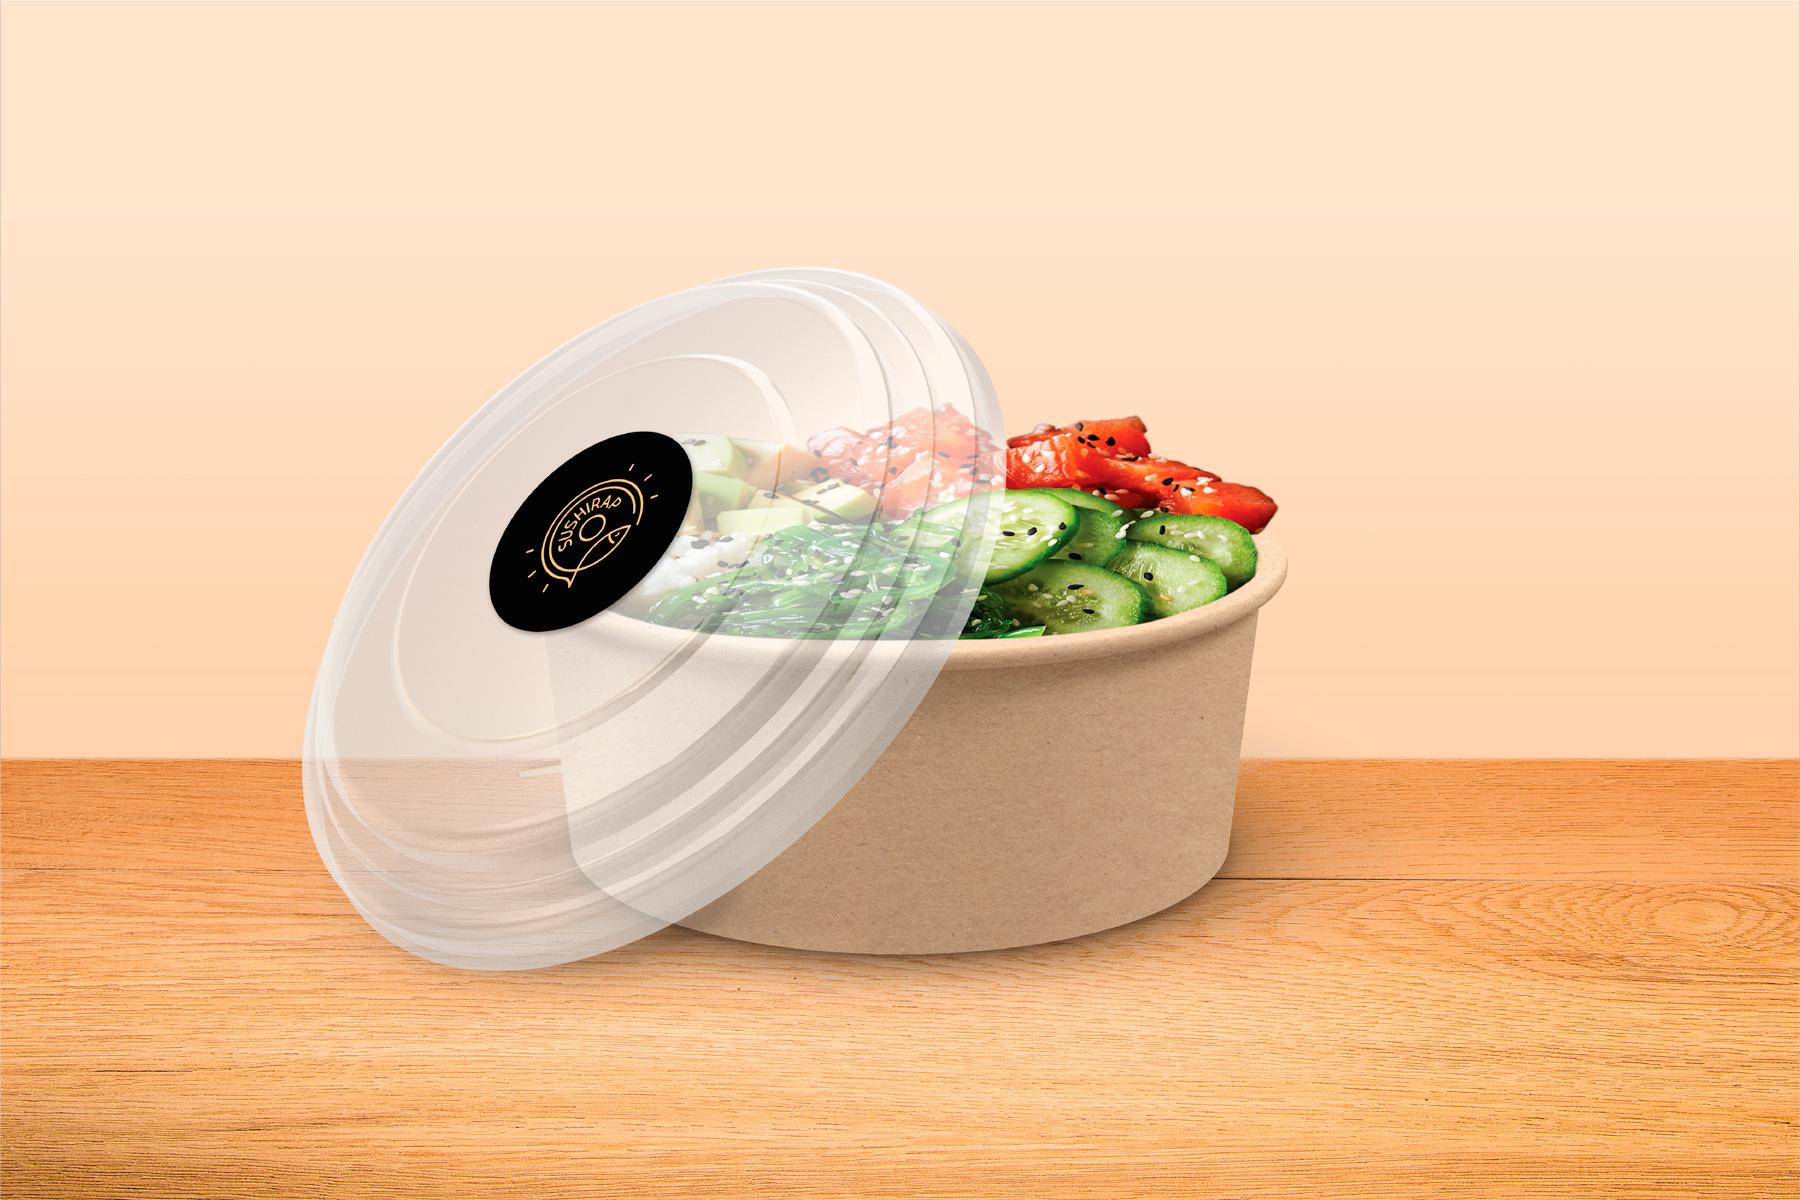 Sushirap-branding-packaging-sticker-design-graphic-designer-sydney-5